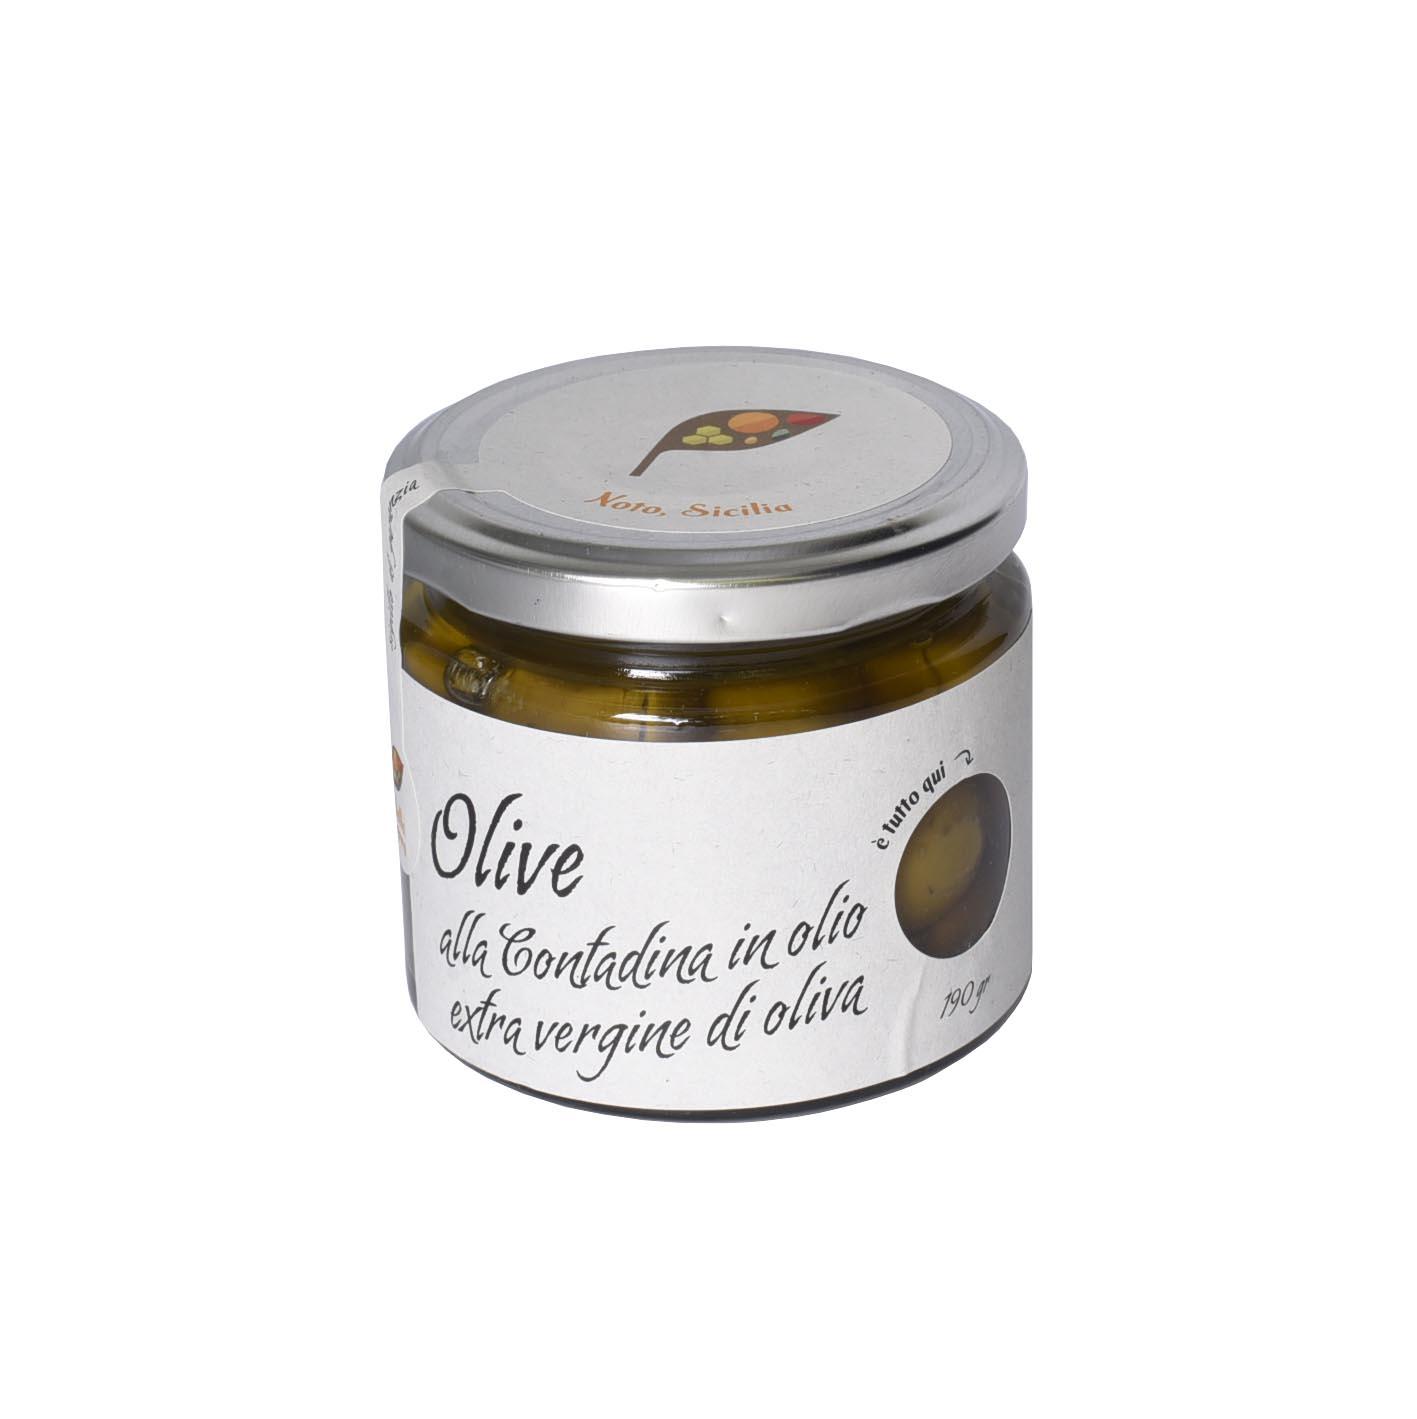 Olive Nocellara dell'Etna alla contadina 190 gr